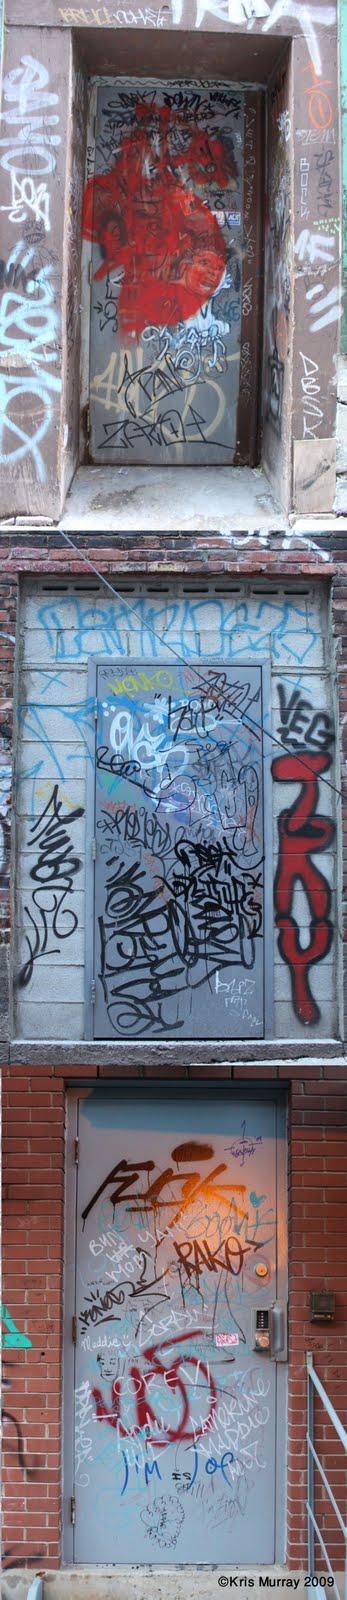 [Plateau+Doors+Collage+Oct+25+2009+3e.jpg]